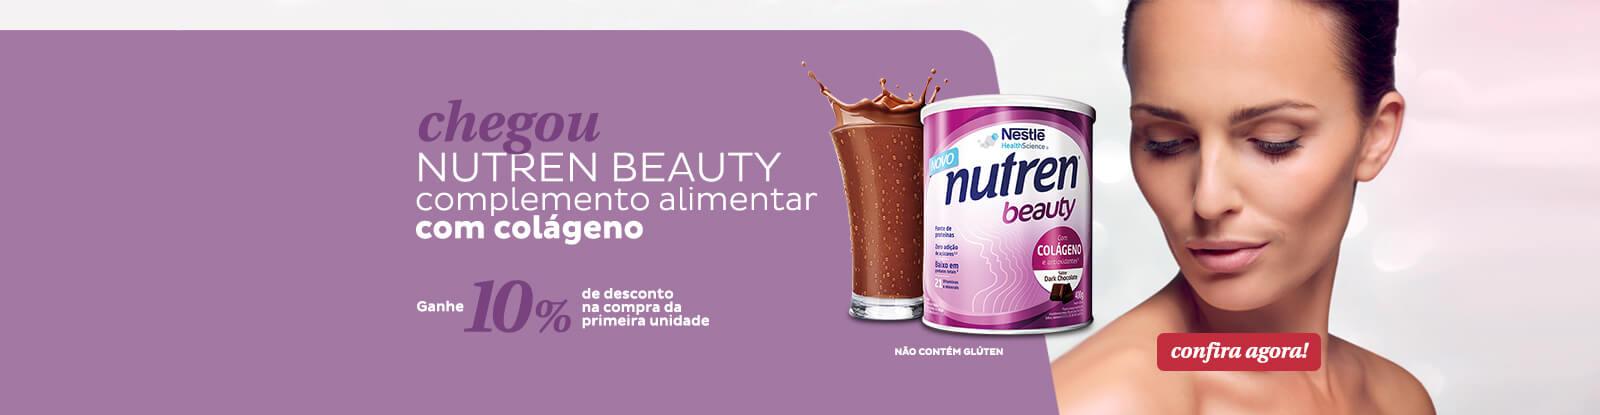 Nutren_Beauty